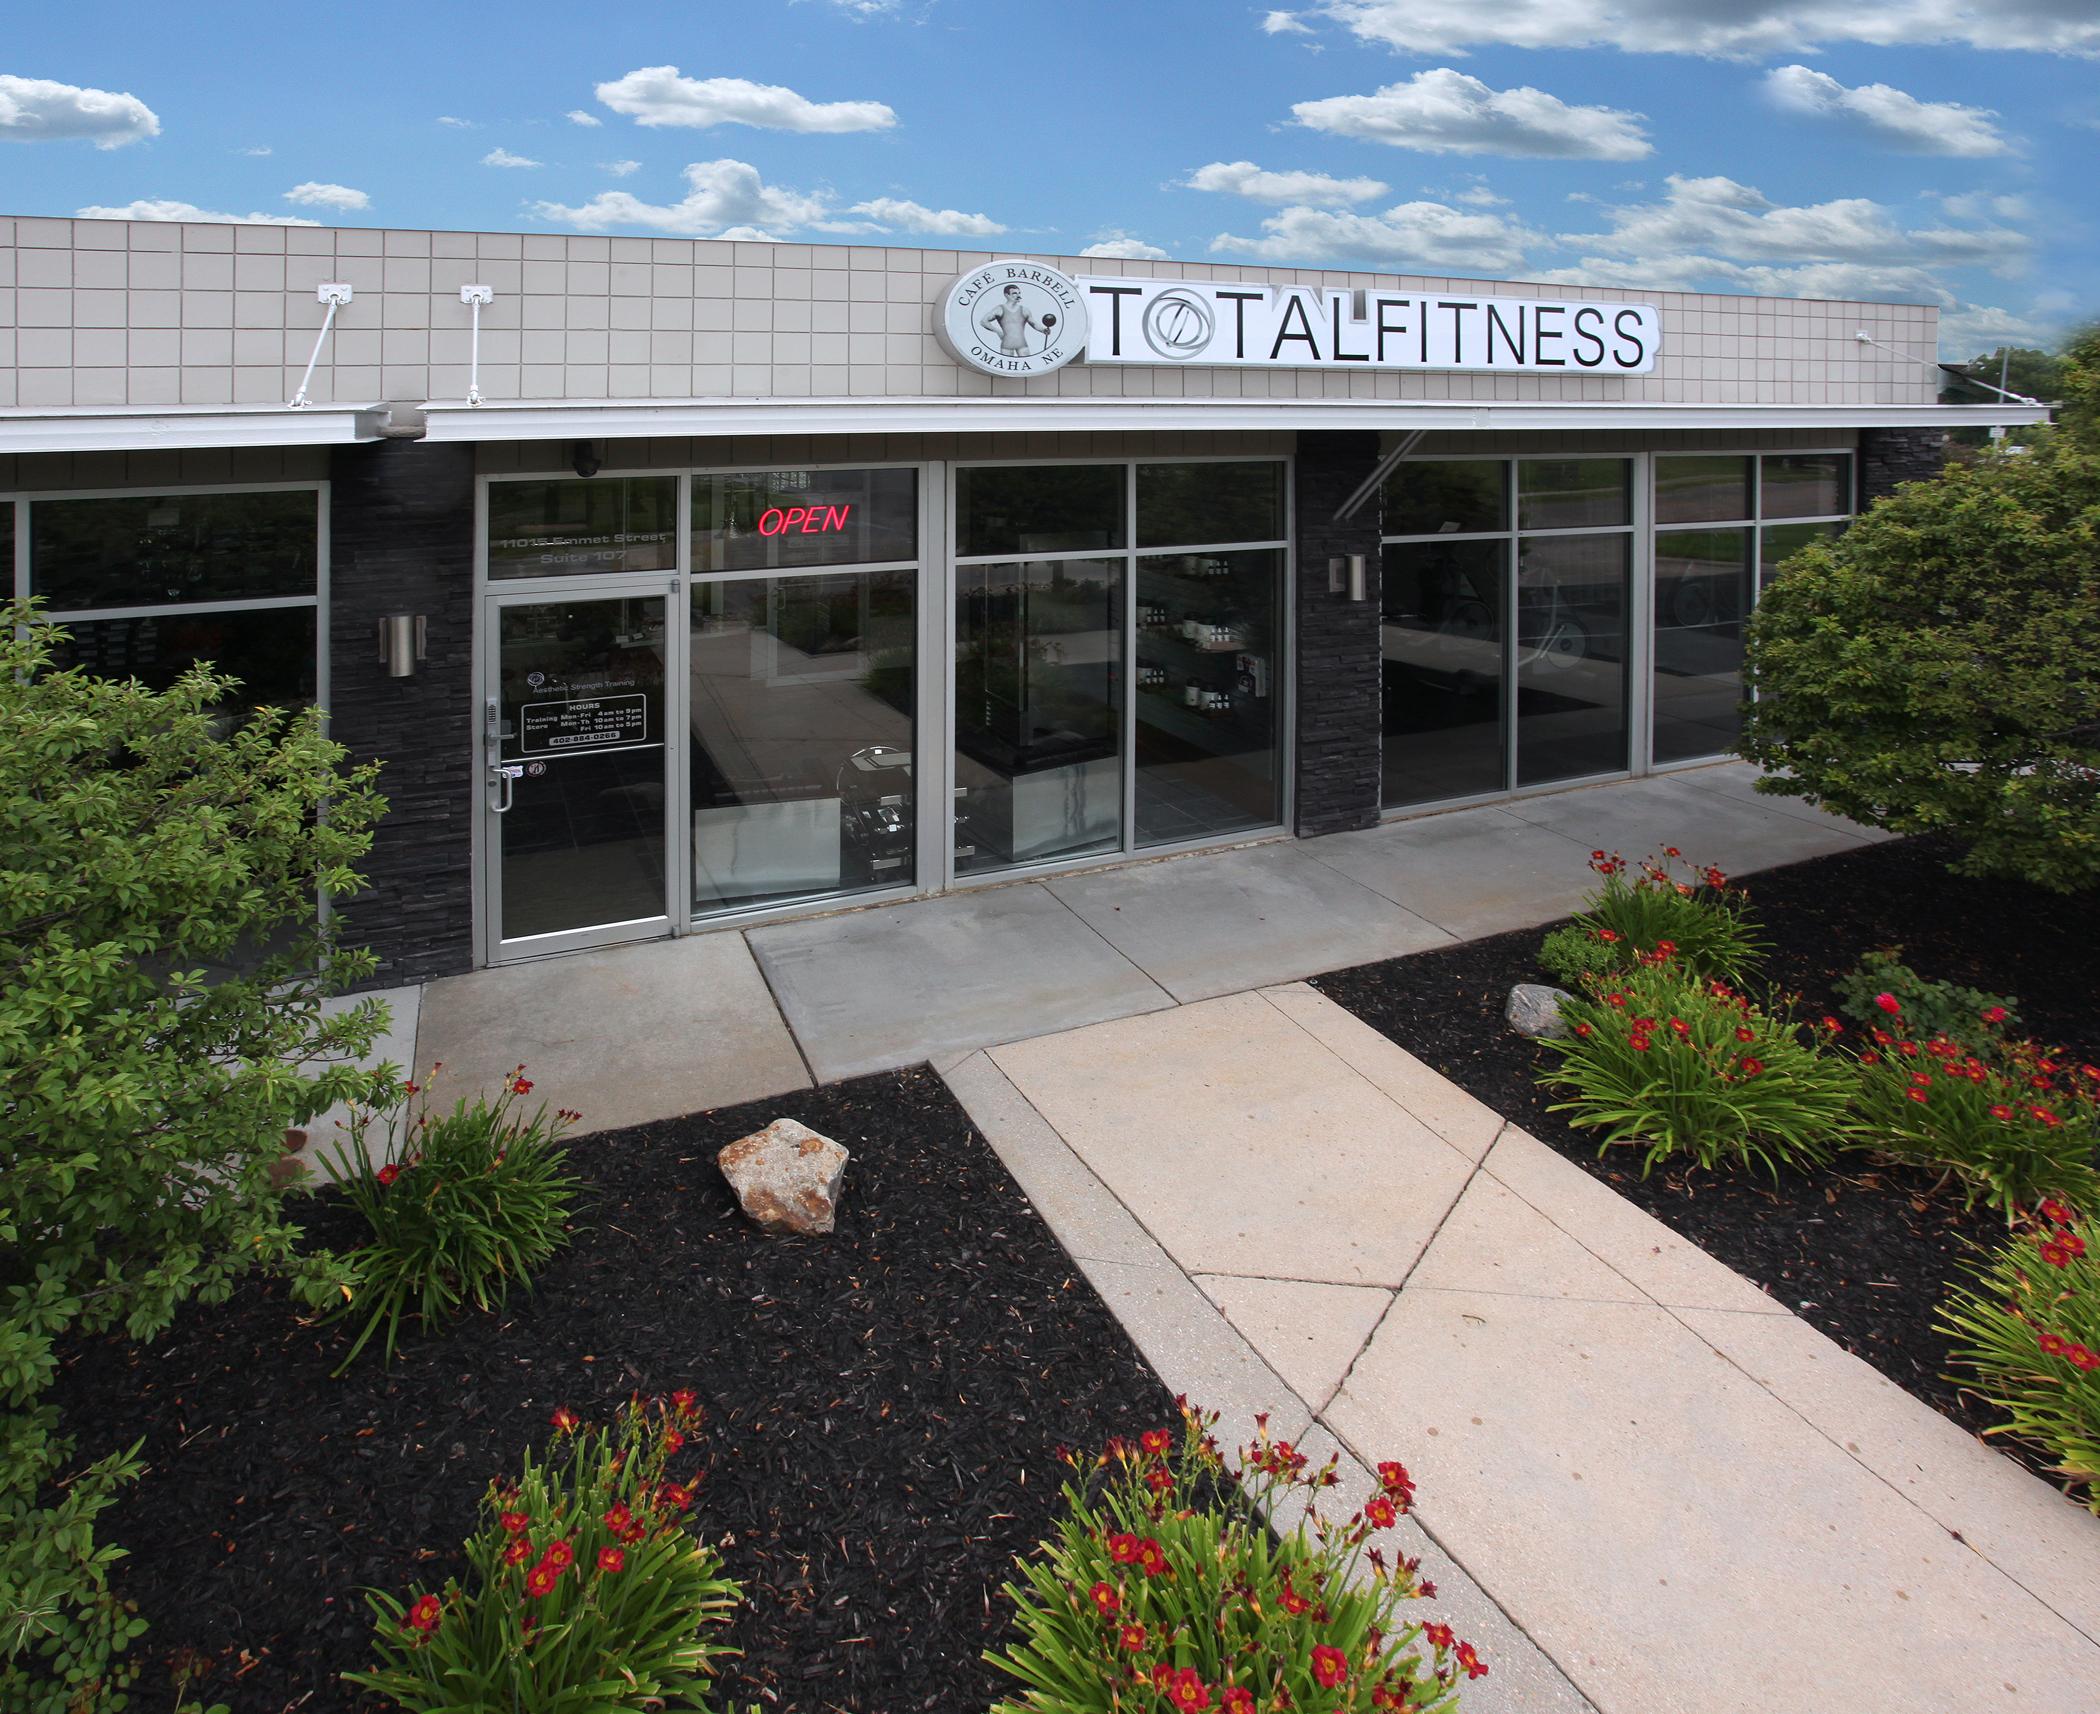 TOTALFITNESS & CAFÉ BARBELL